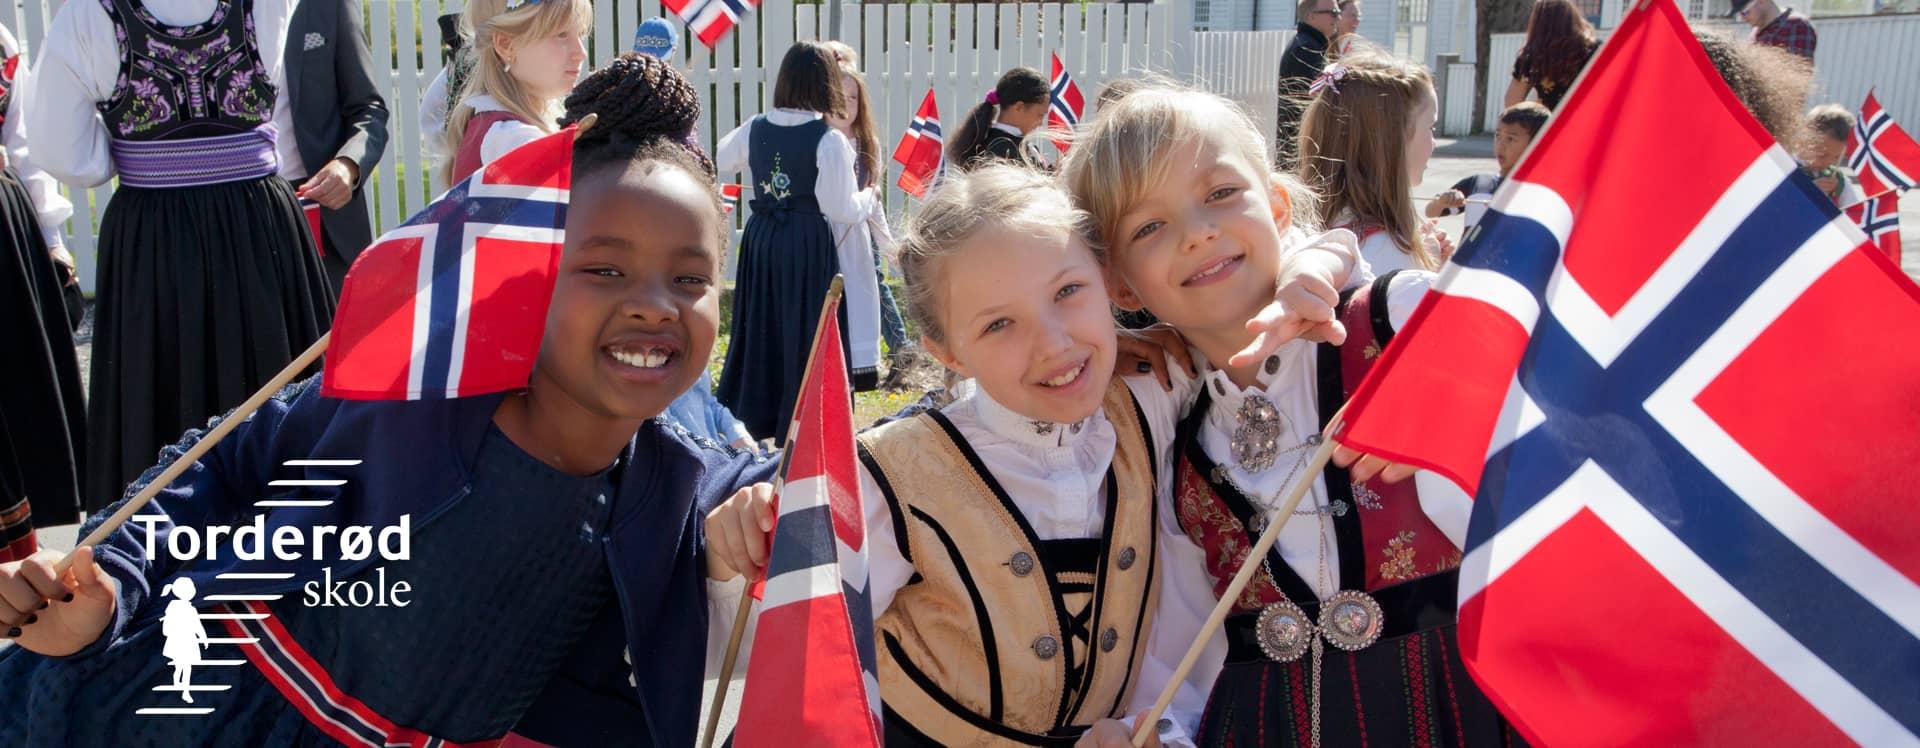 17. mai 2019 Torderød skole - barnetoget - Moss